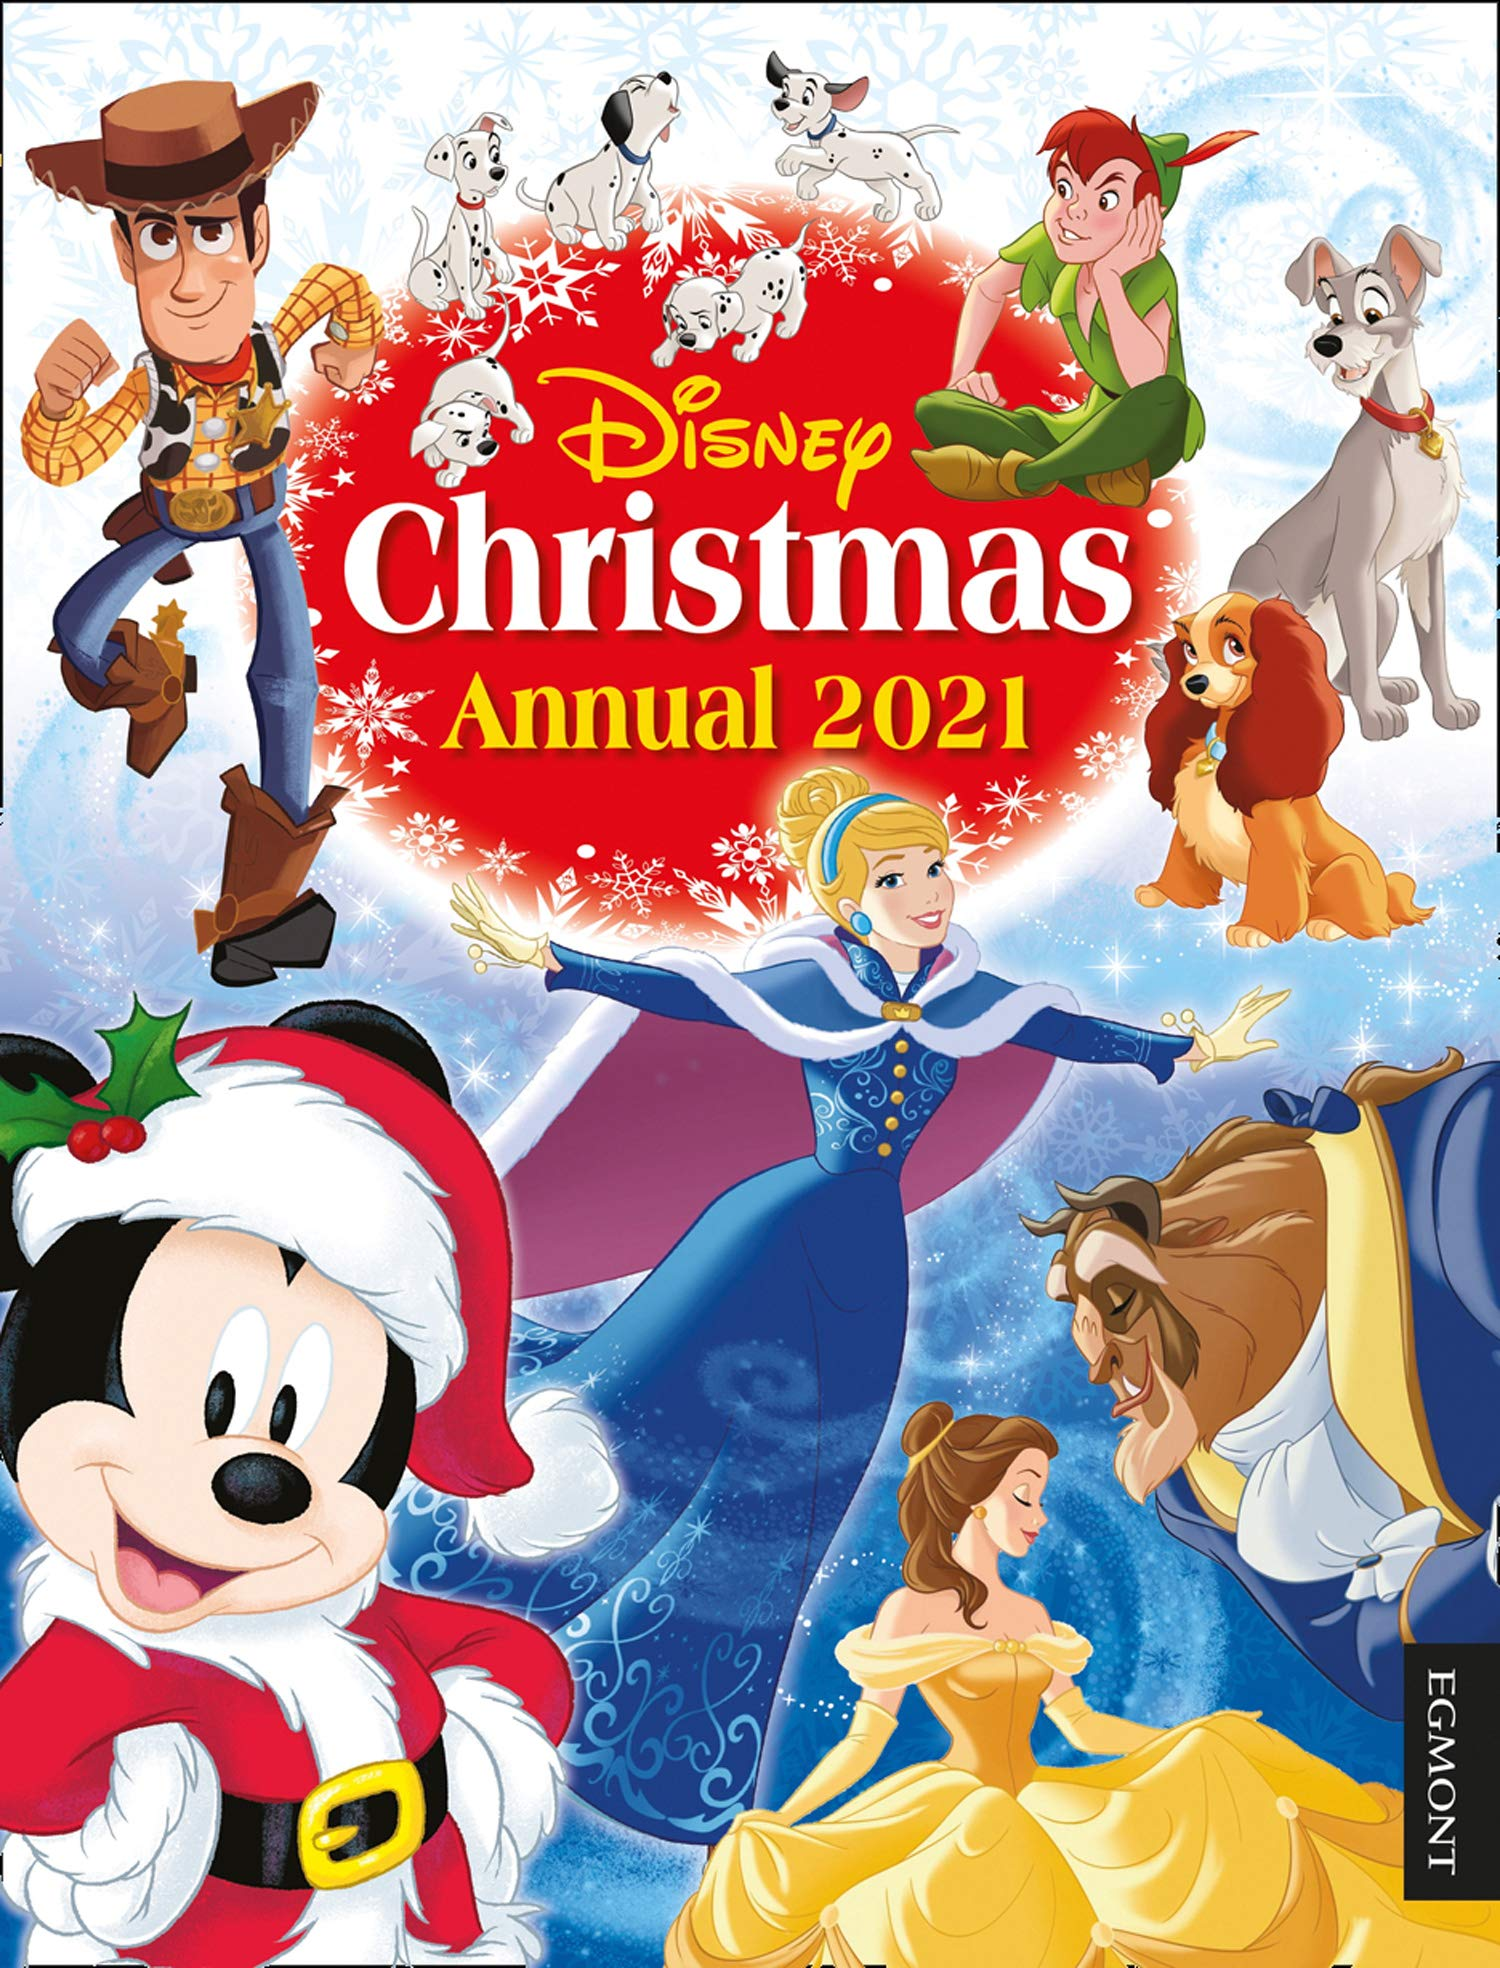 Disney Christmas Package 2021 Disney Christmas Annual 2021 9781405299619 Amazon Com Books